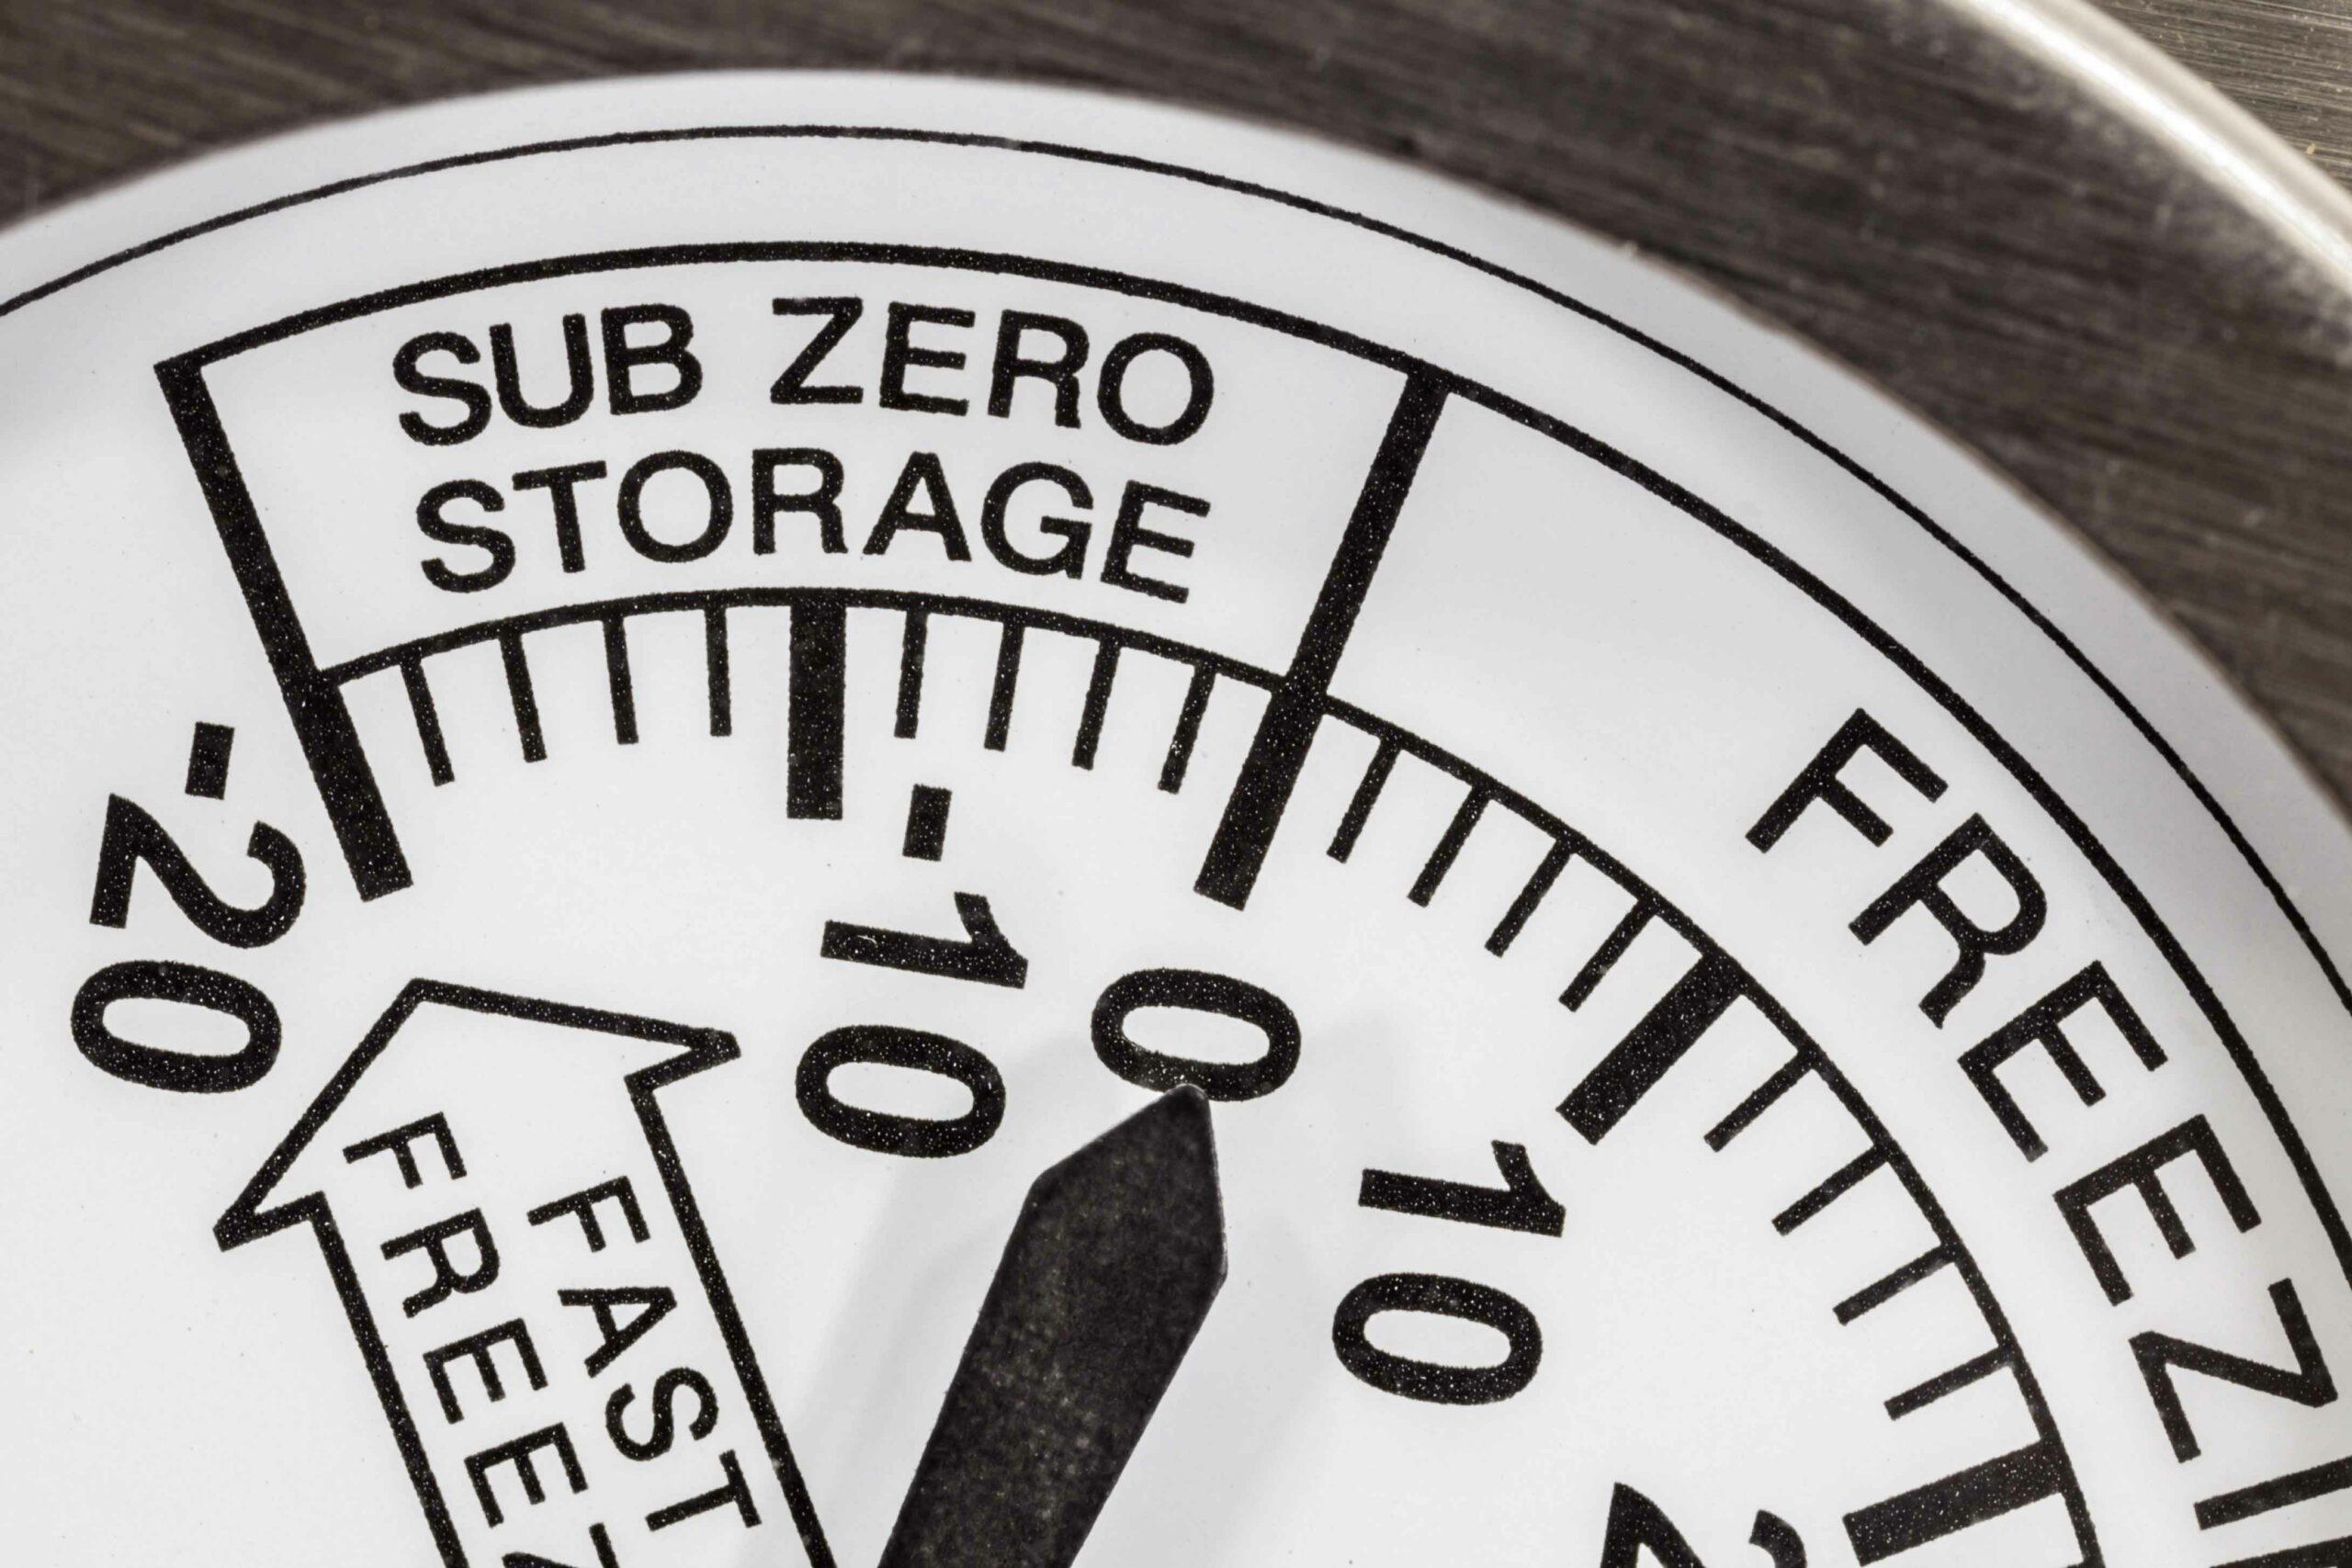 sub-zero-refrigerator-thermometer